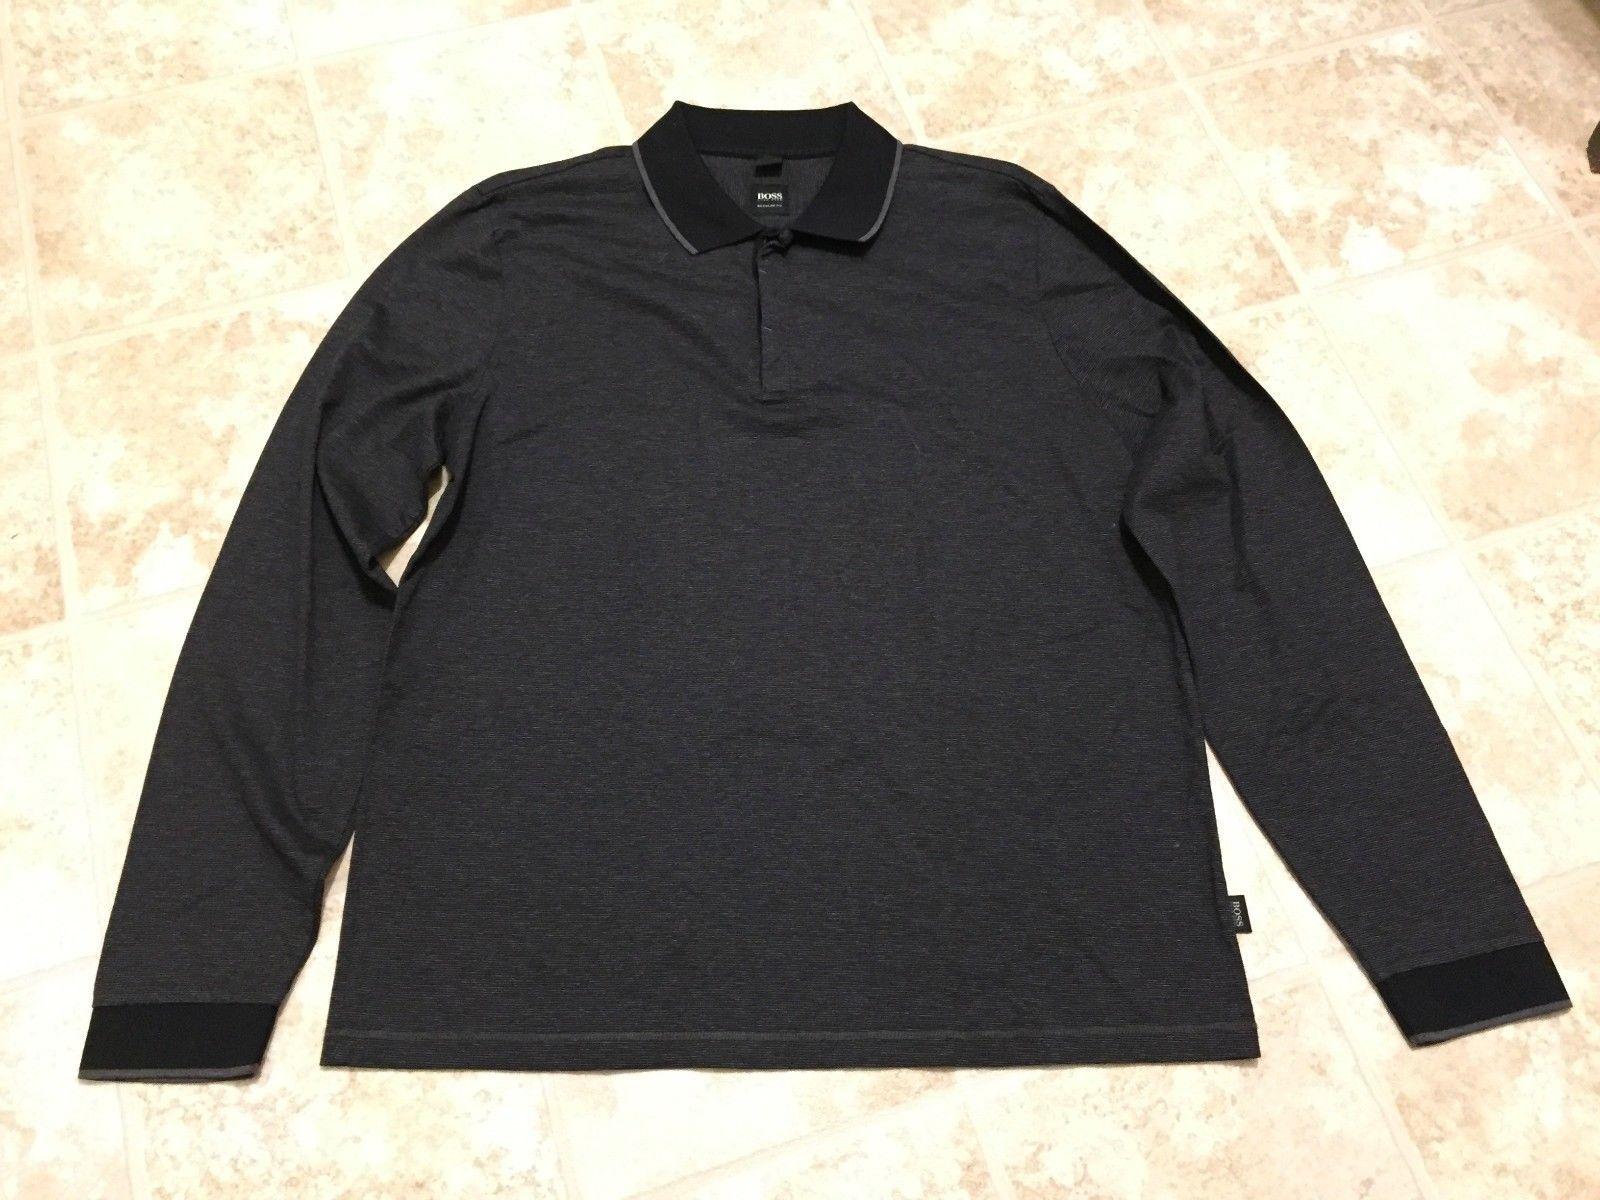 c2f31bac 57. 57. Previous. Hugo Boss Mens Long Sleeve Polo Shirt Cotton Black International  Size XL